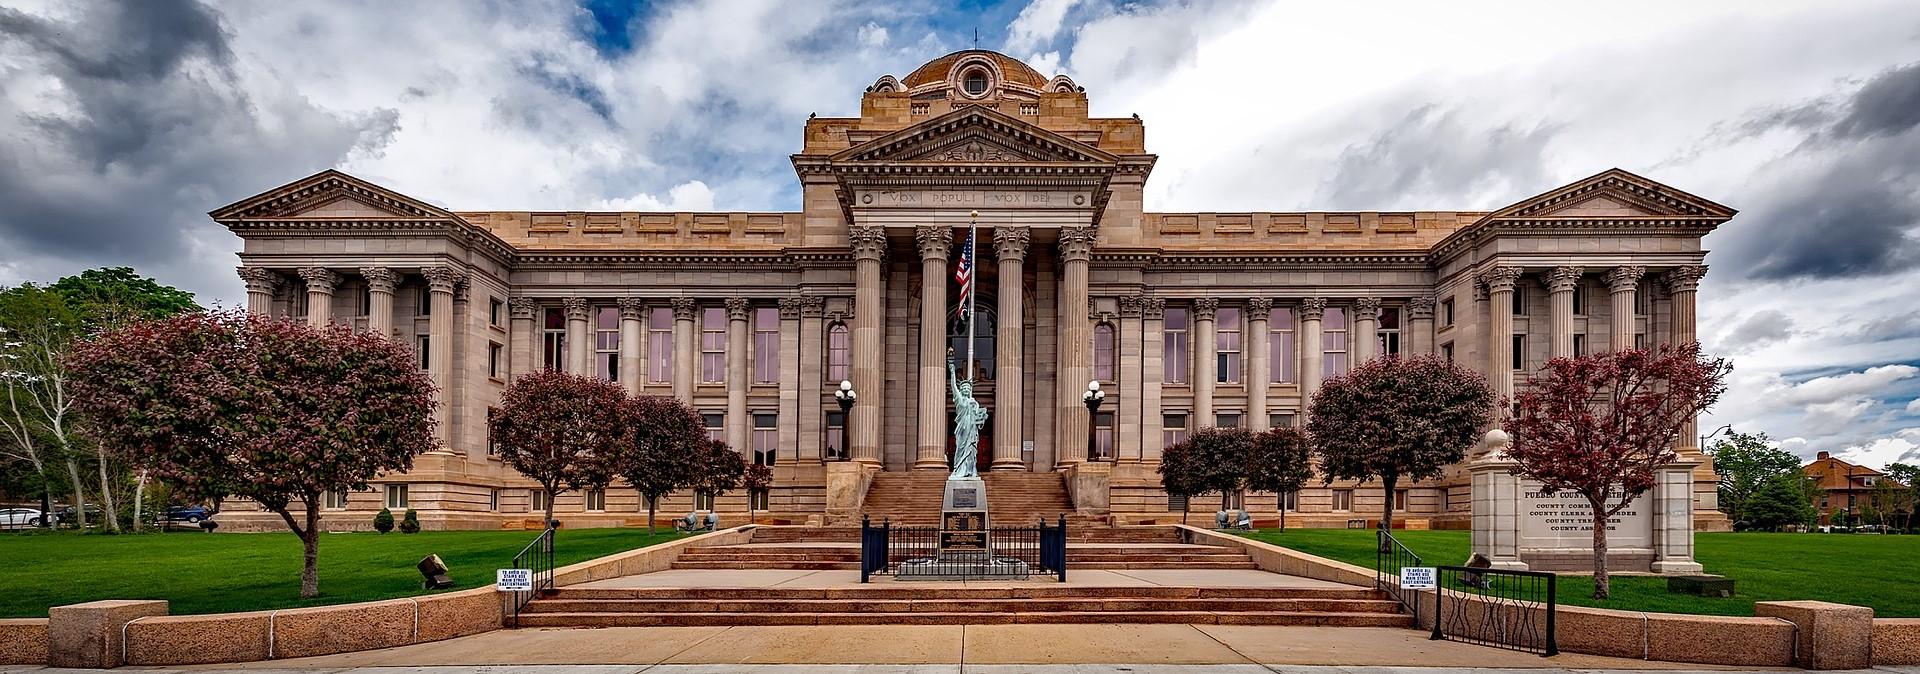 Courthouse in Pueblo Colorado - CarDonations4Cancer.org